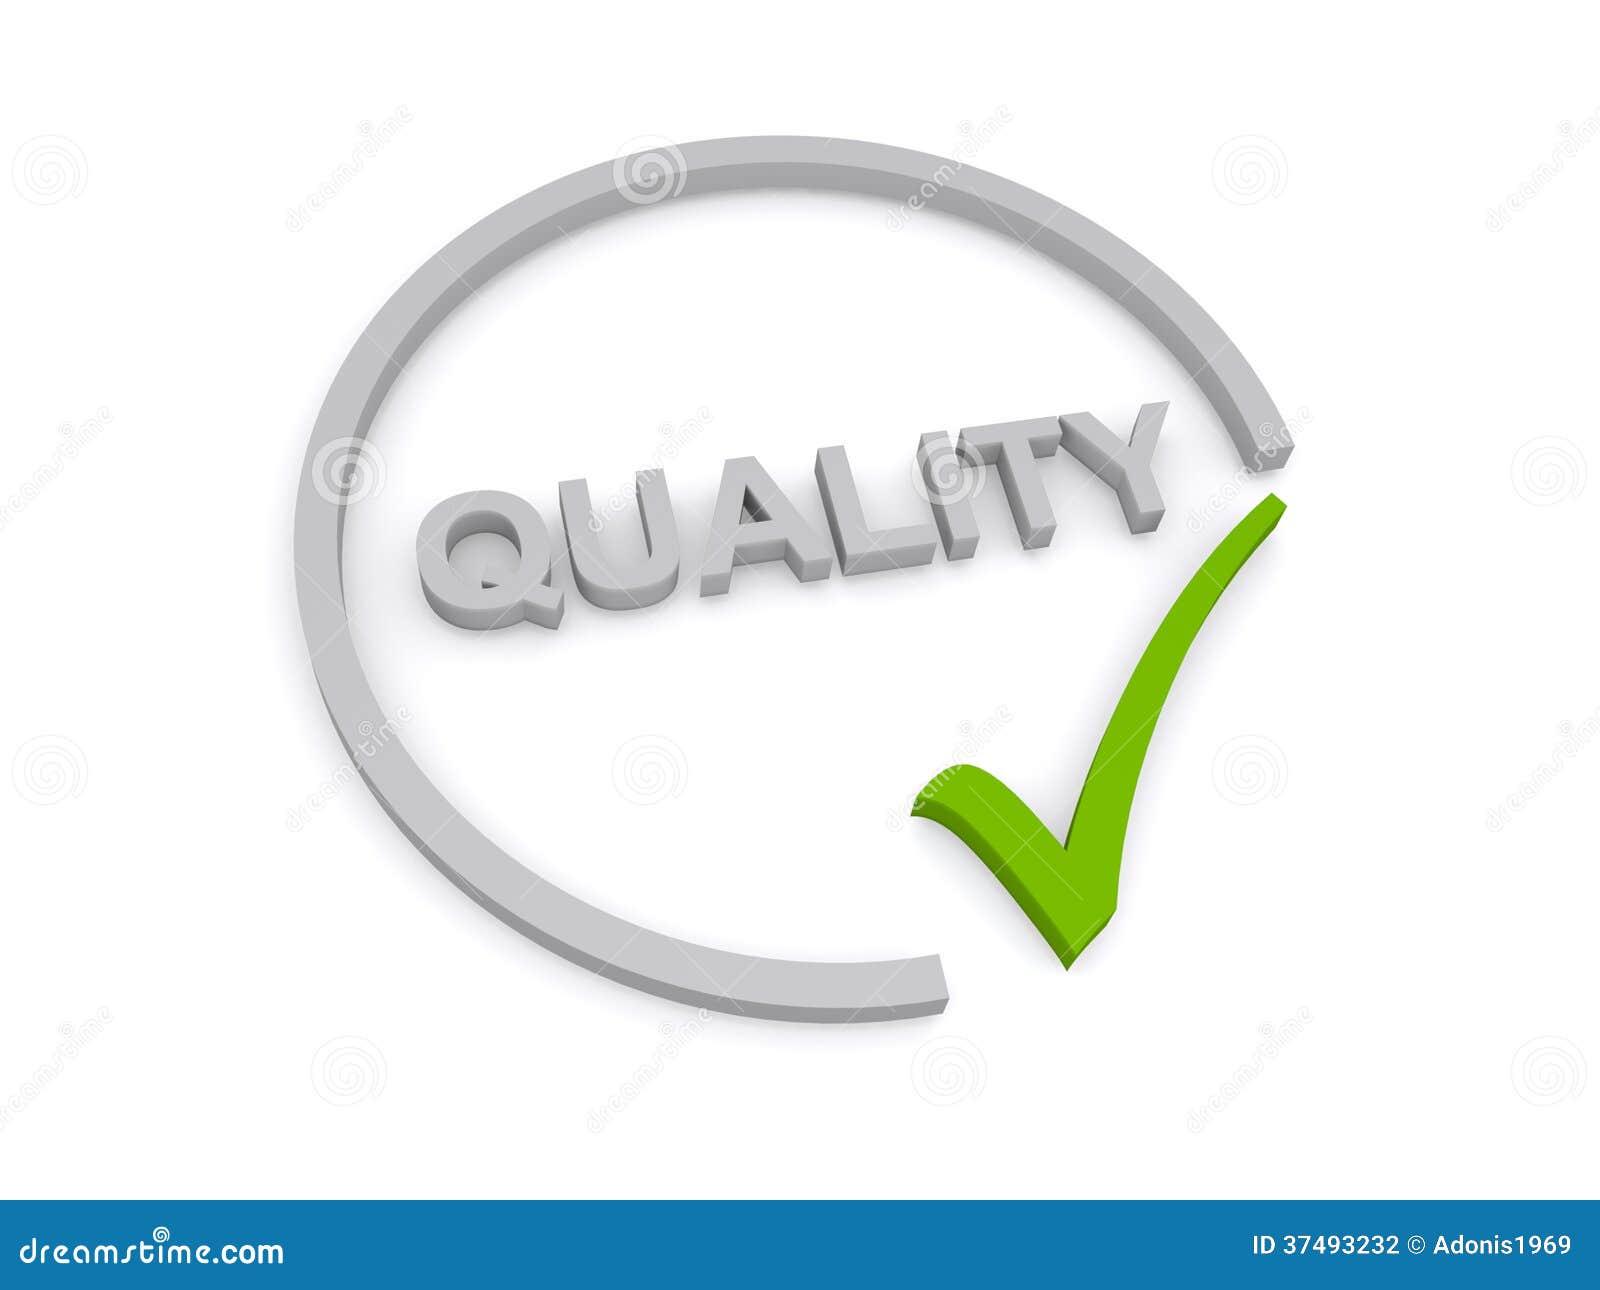 quality sign stock photography image 37493232 thinking clip art emoji thinking clip art emoji